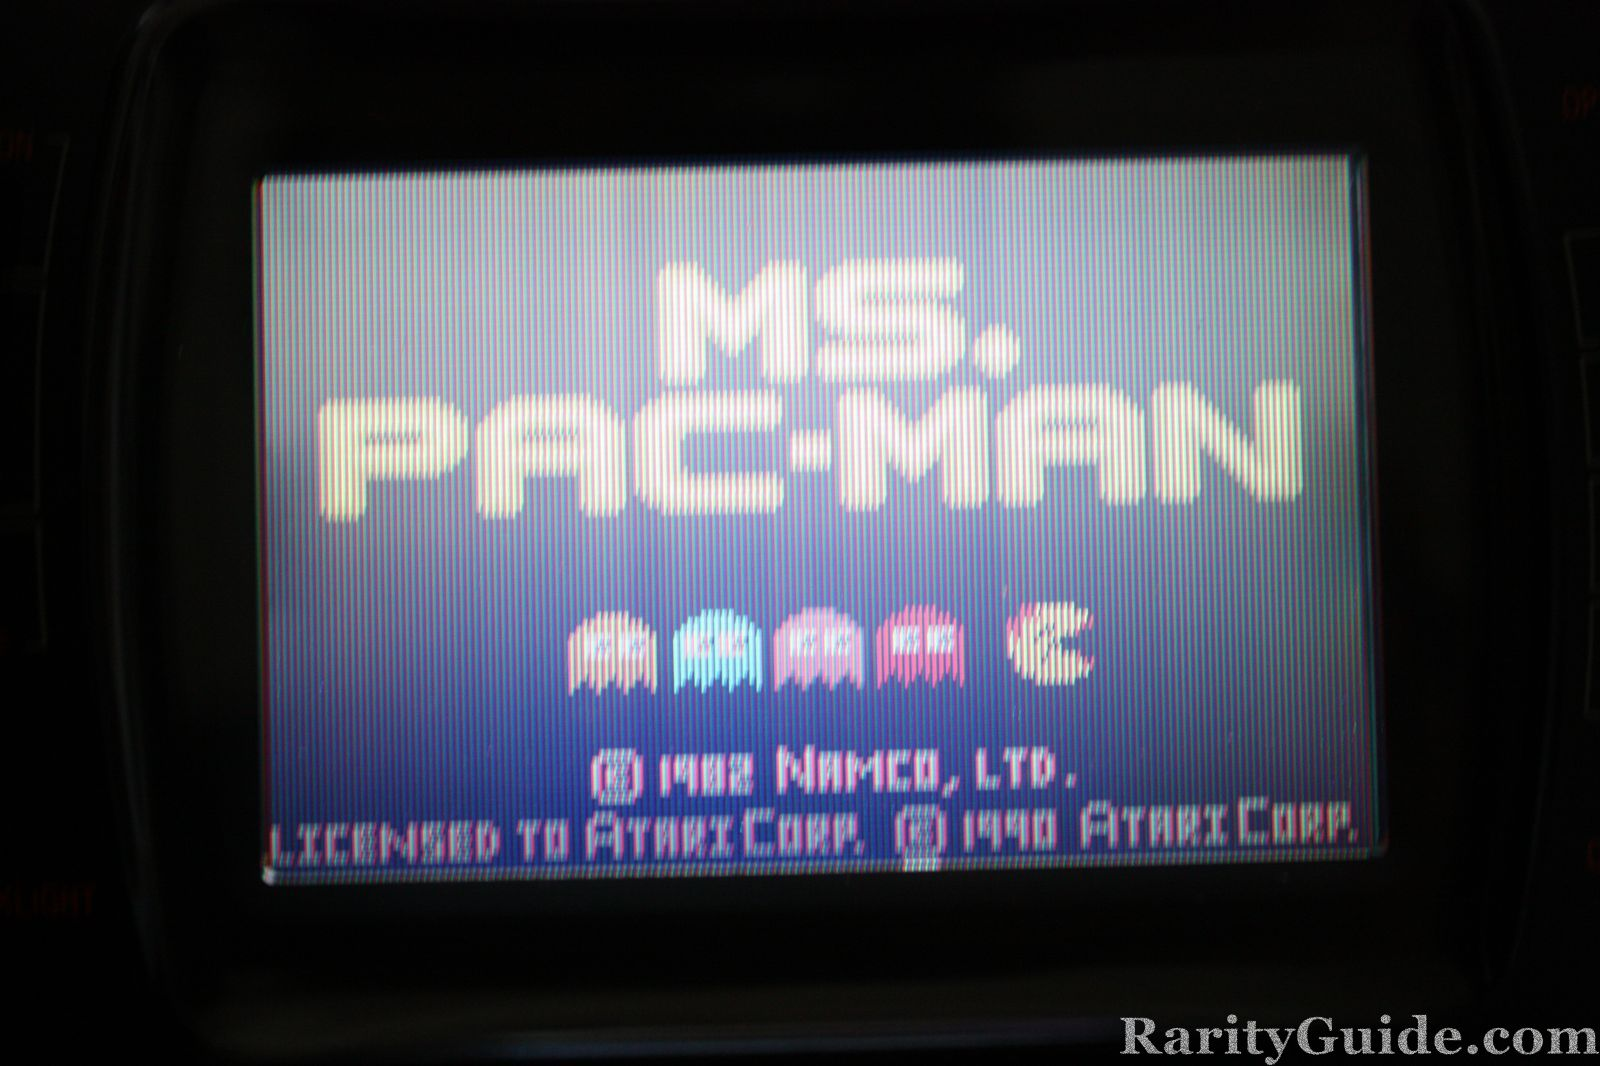 Ms. Pac-Man Title Screen shot